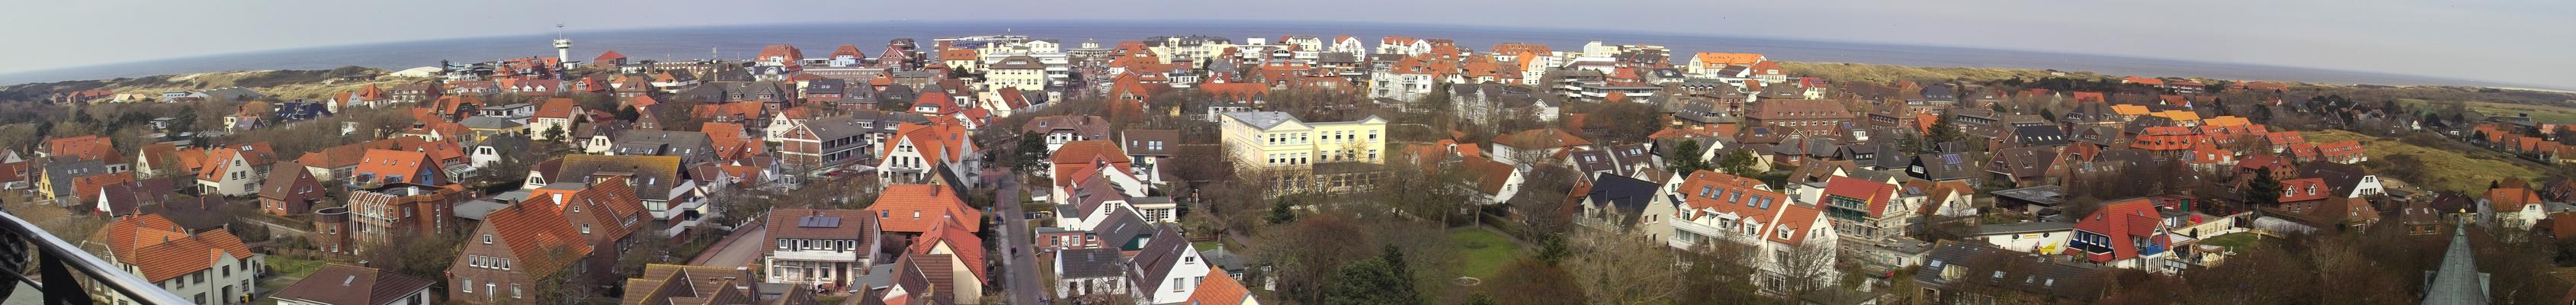 Dorfpanorama Wangerooge